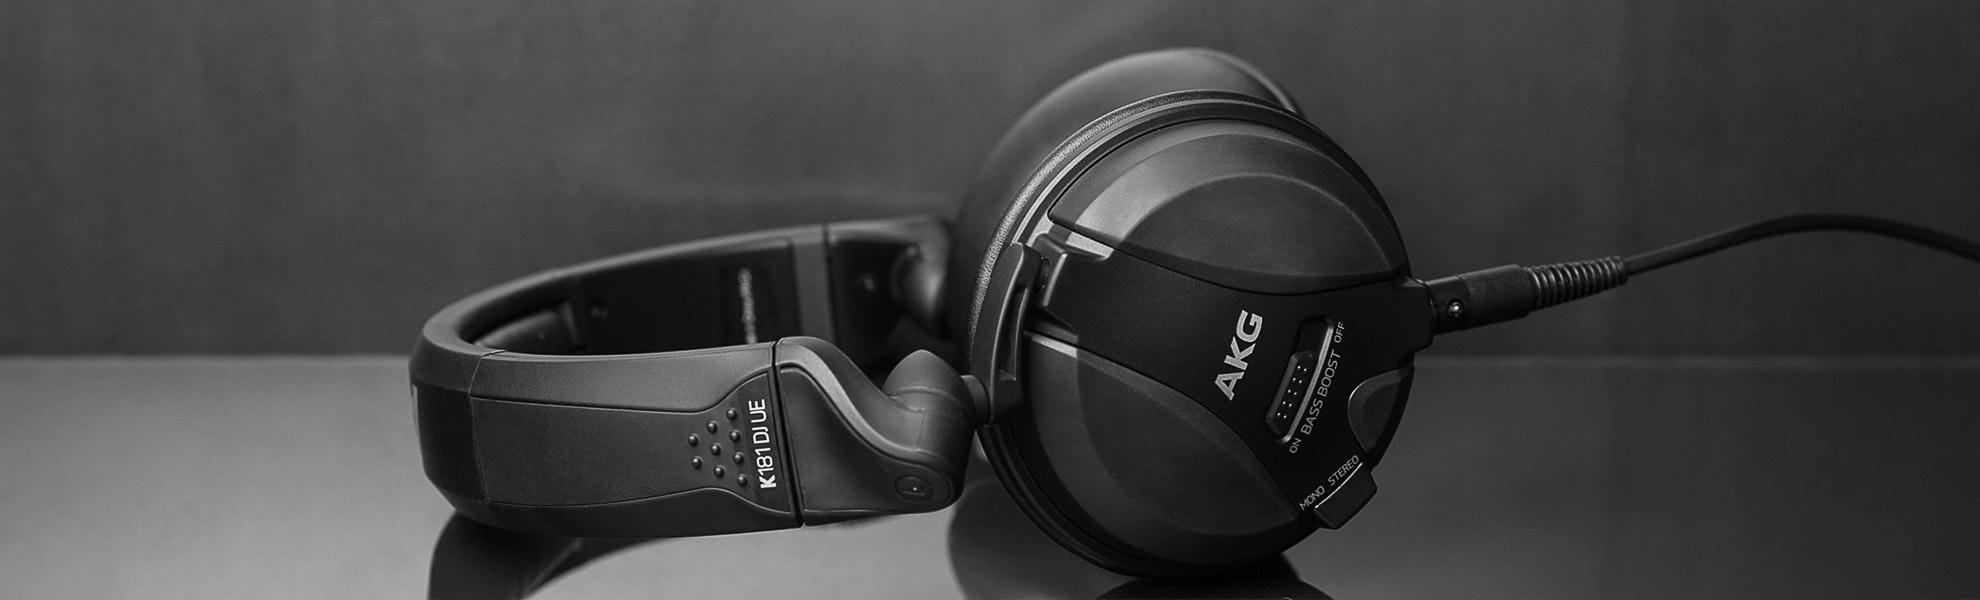 AKG K181 DJ UE Reference Class Headphones